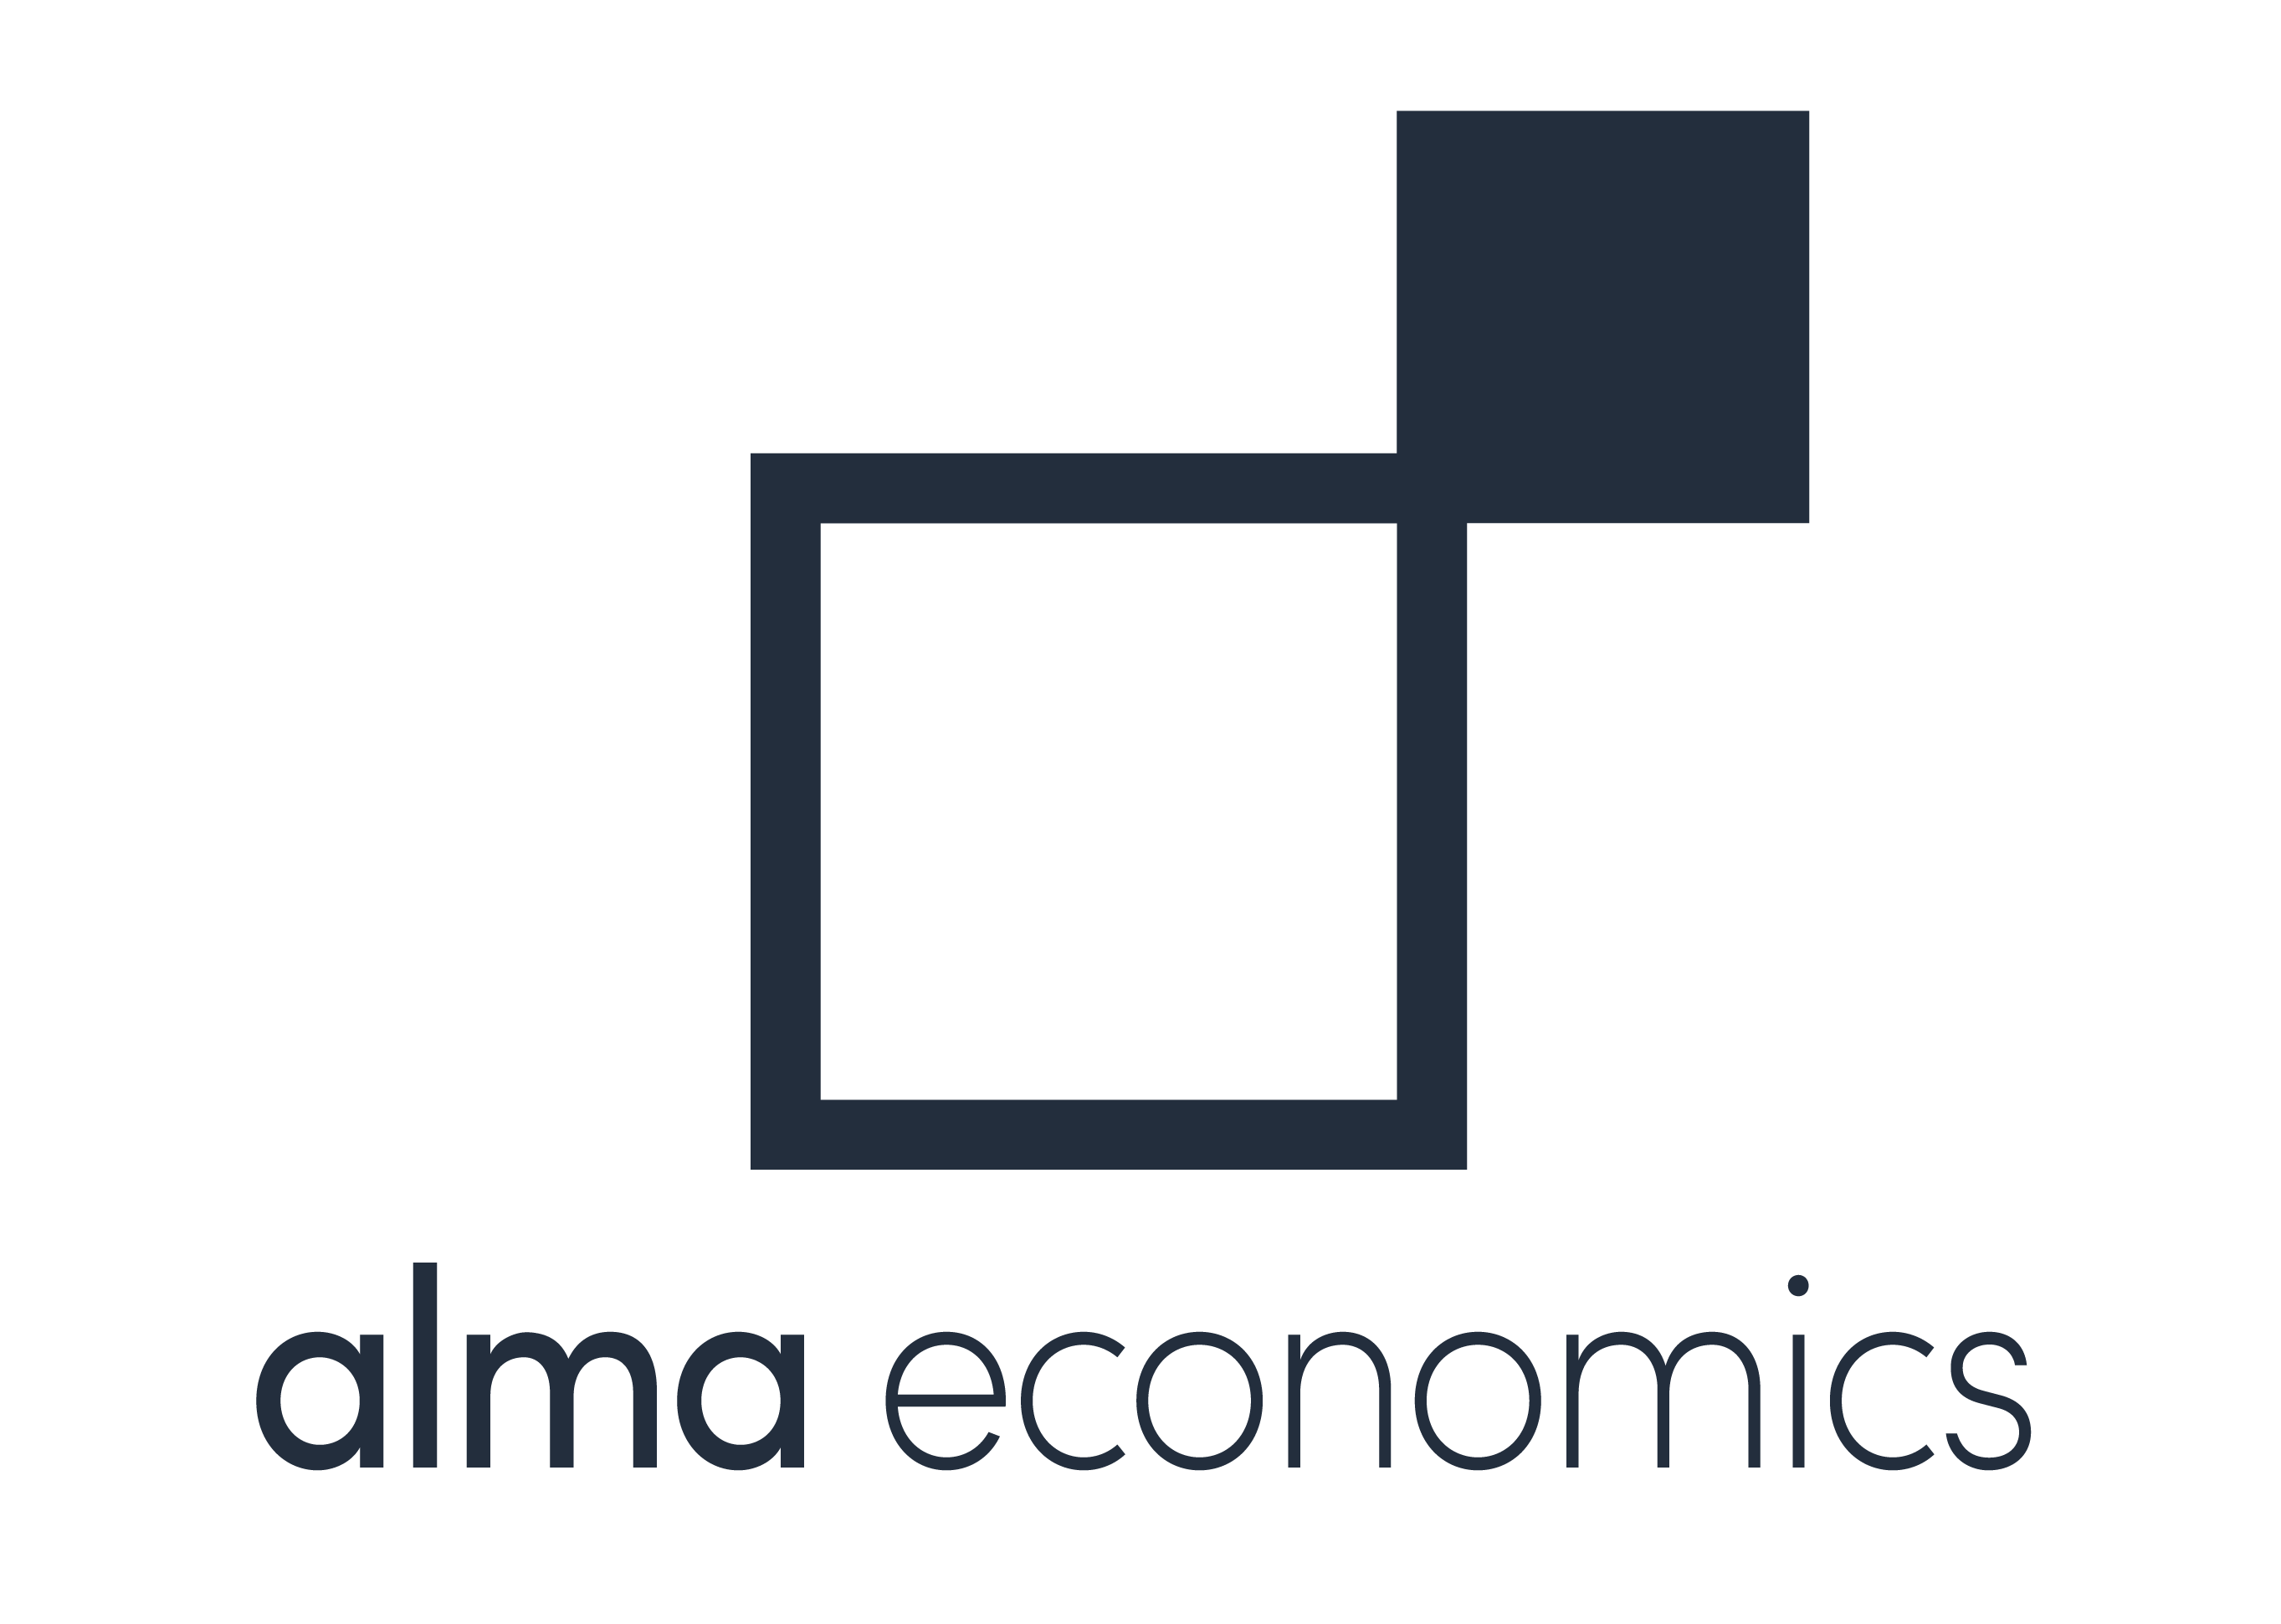 Alma Economics